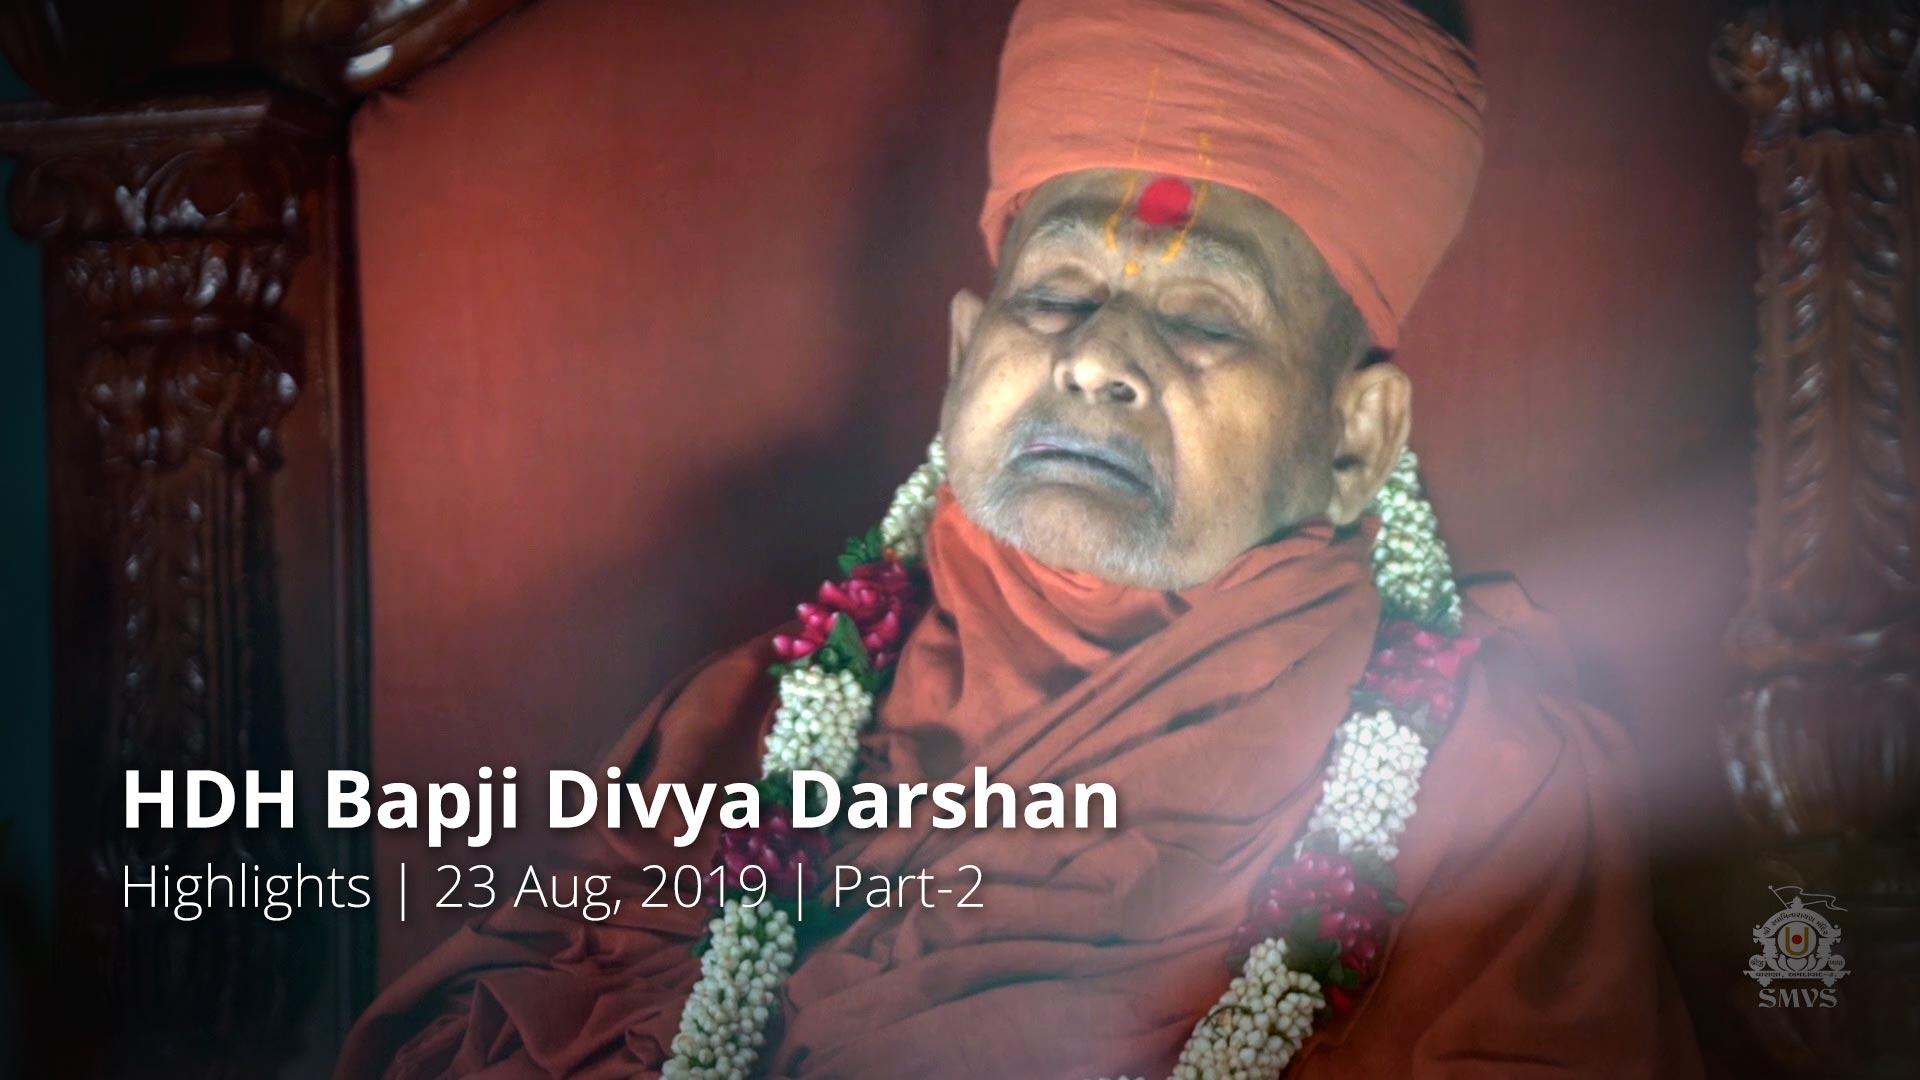 HDH Bapji Divya Darshan | Highlights | 23 Aug, 2019 | Part-2